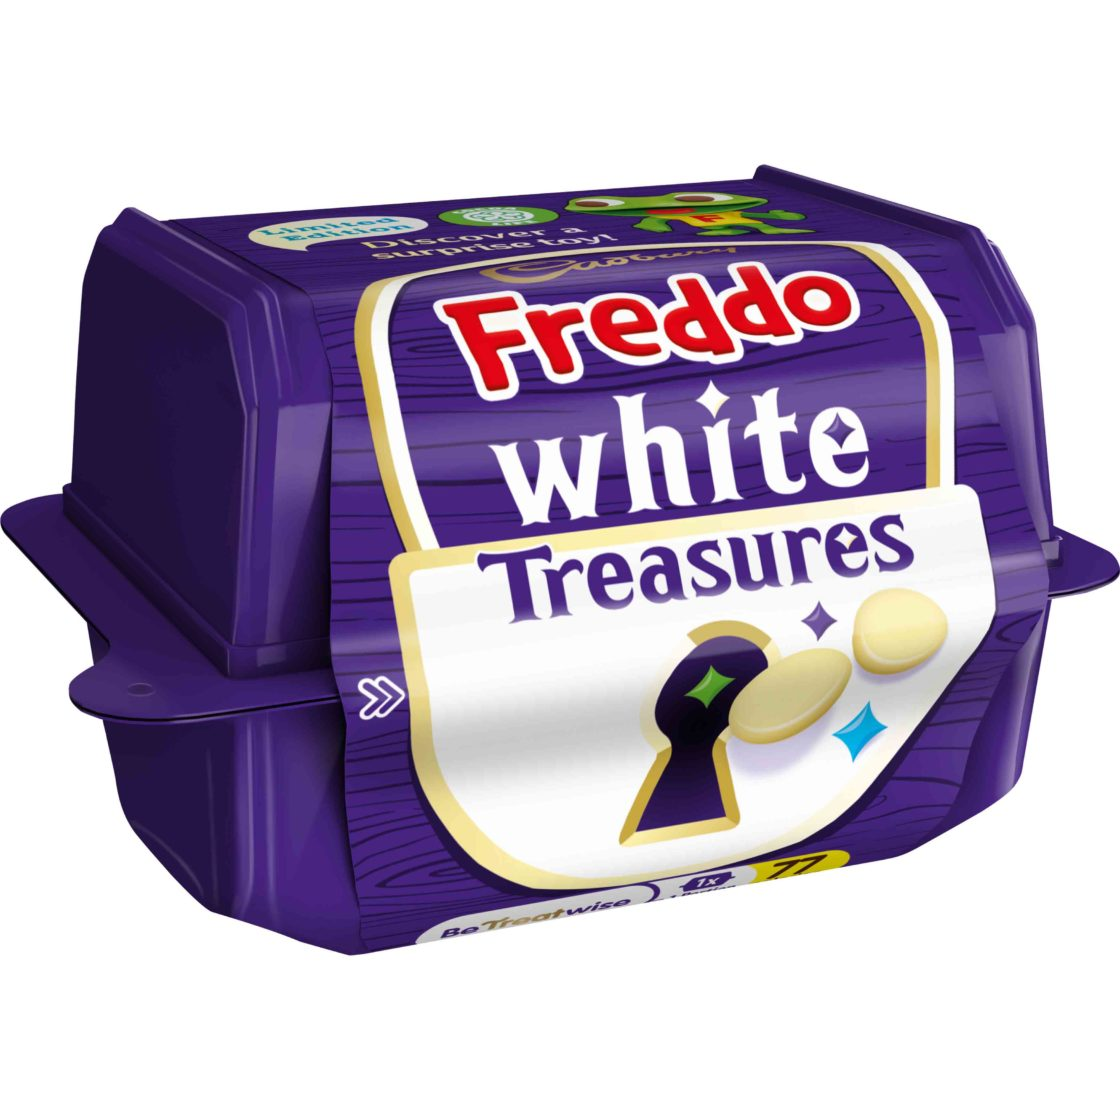 Freddo White Treasures by Cadbury.